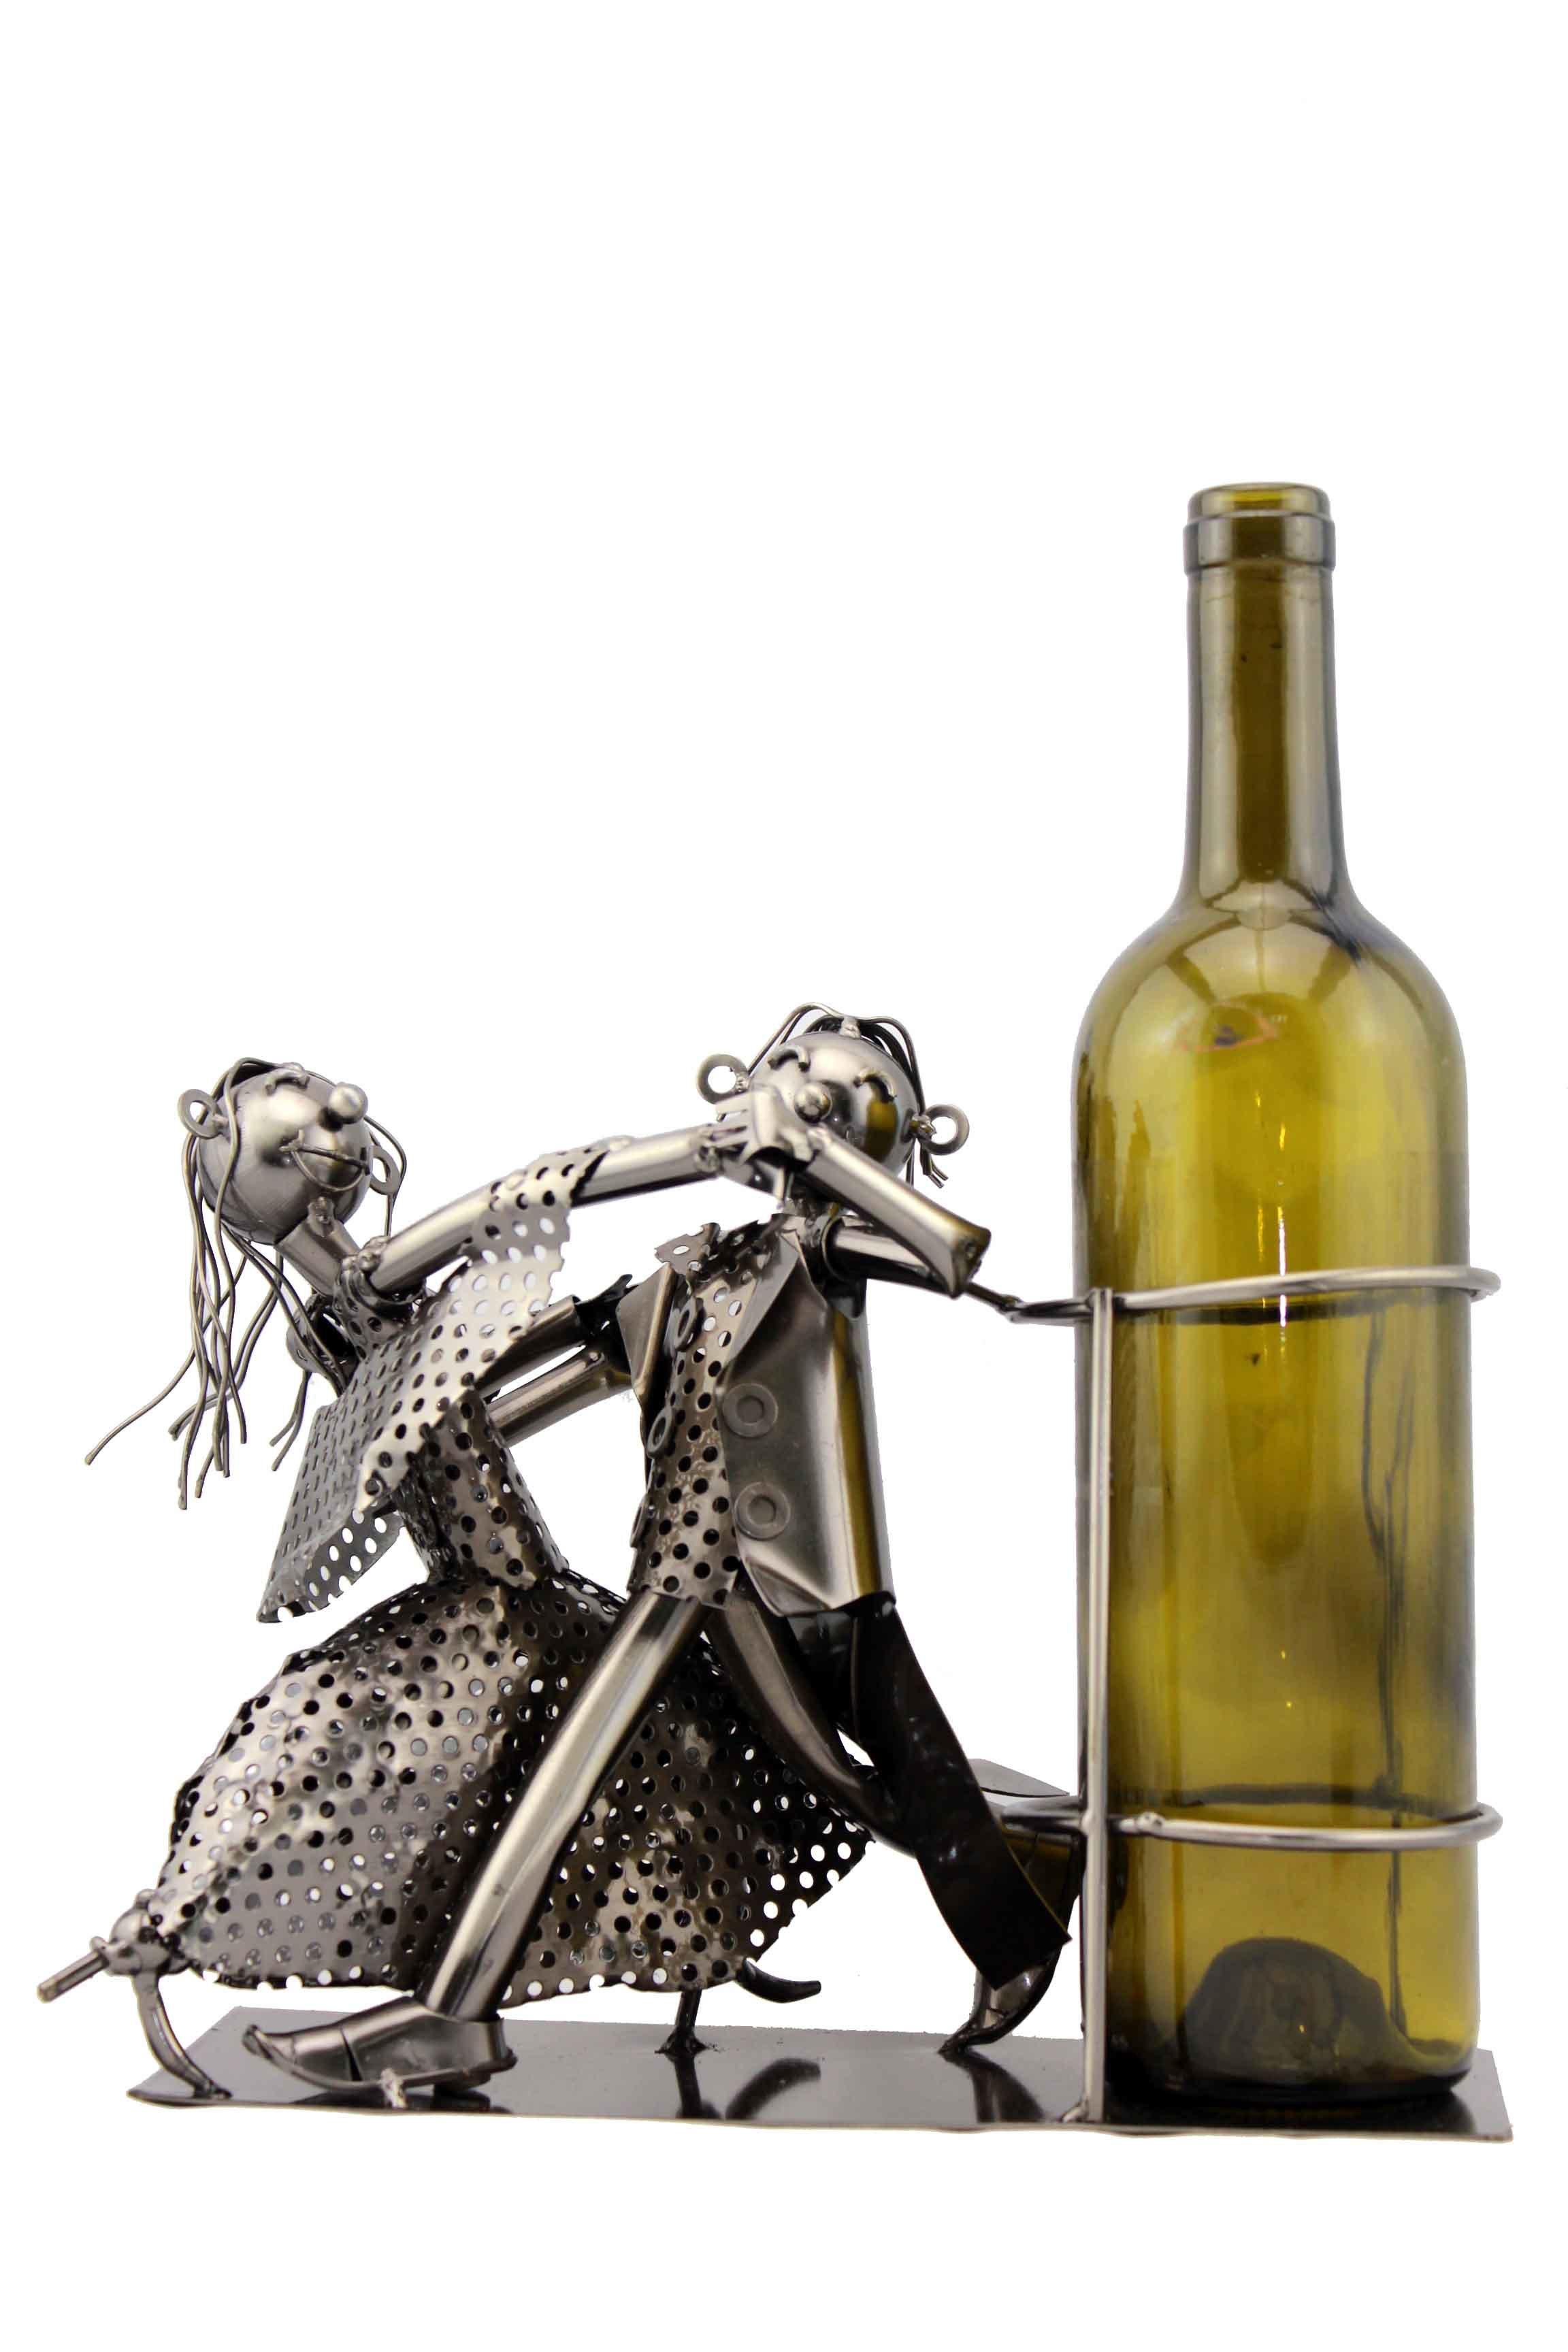 range bouteille porte bouteille mural design en inox porte bouteille de vin ikea. Black Bedroom Furniture Sets. Home Design Ideas